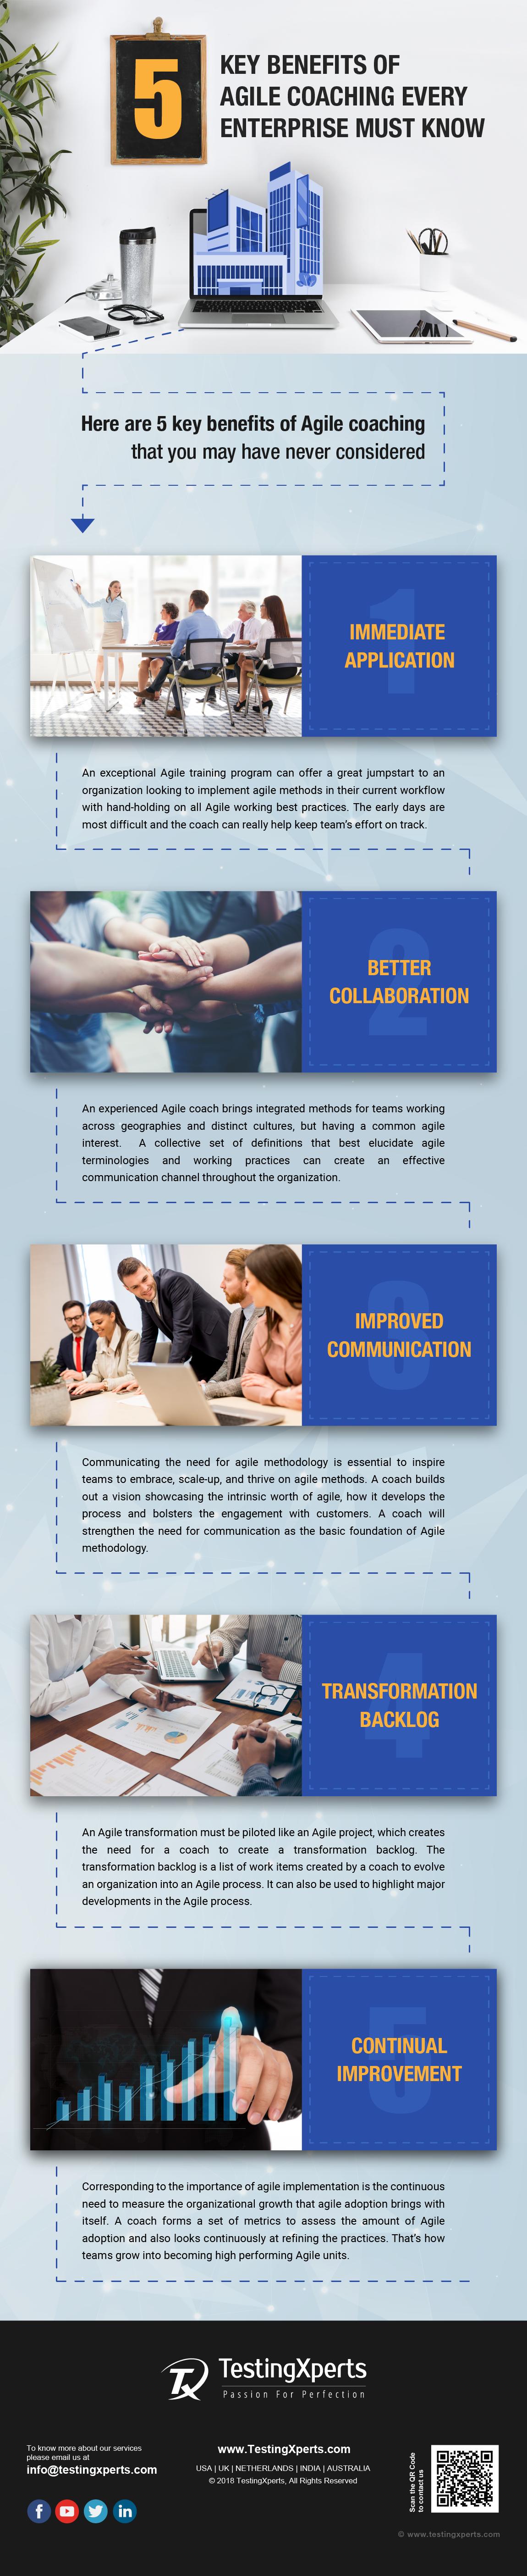 Agile Coaching & methodology Benefits|Infographic